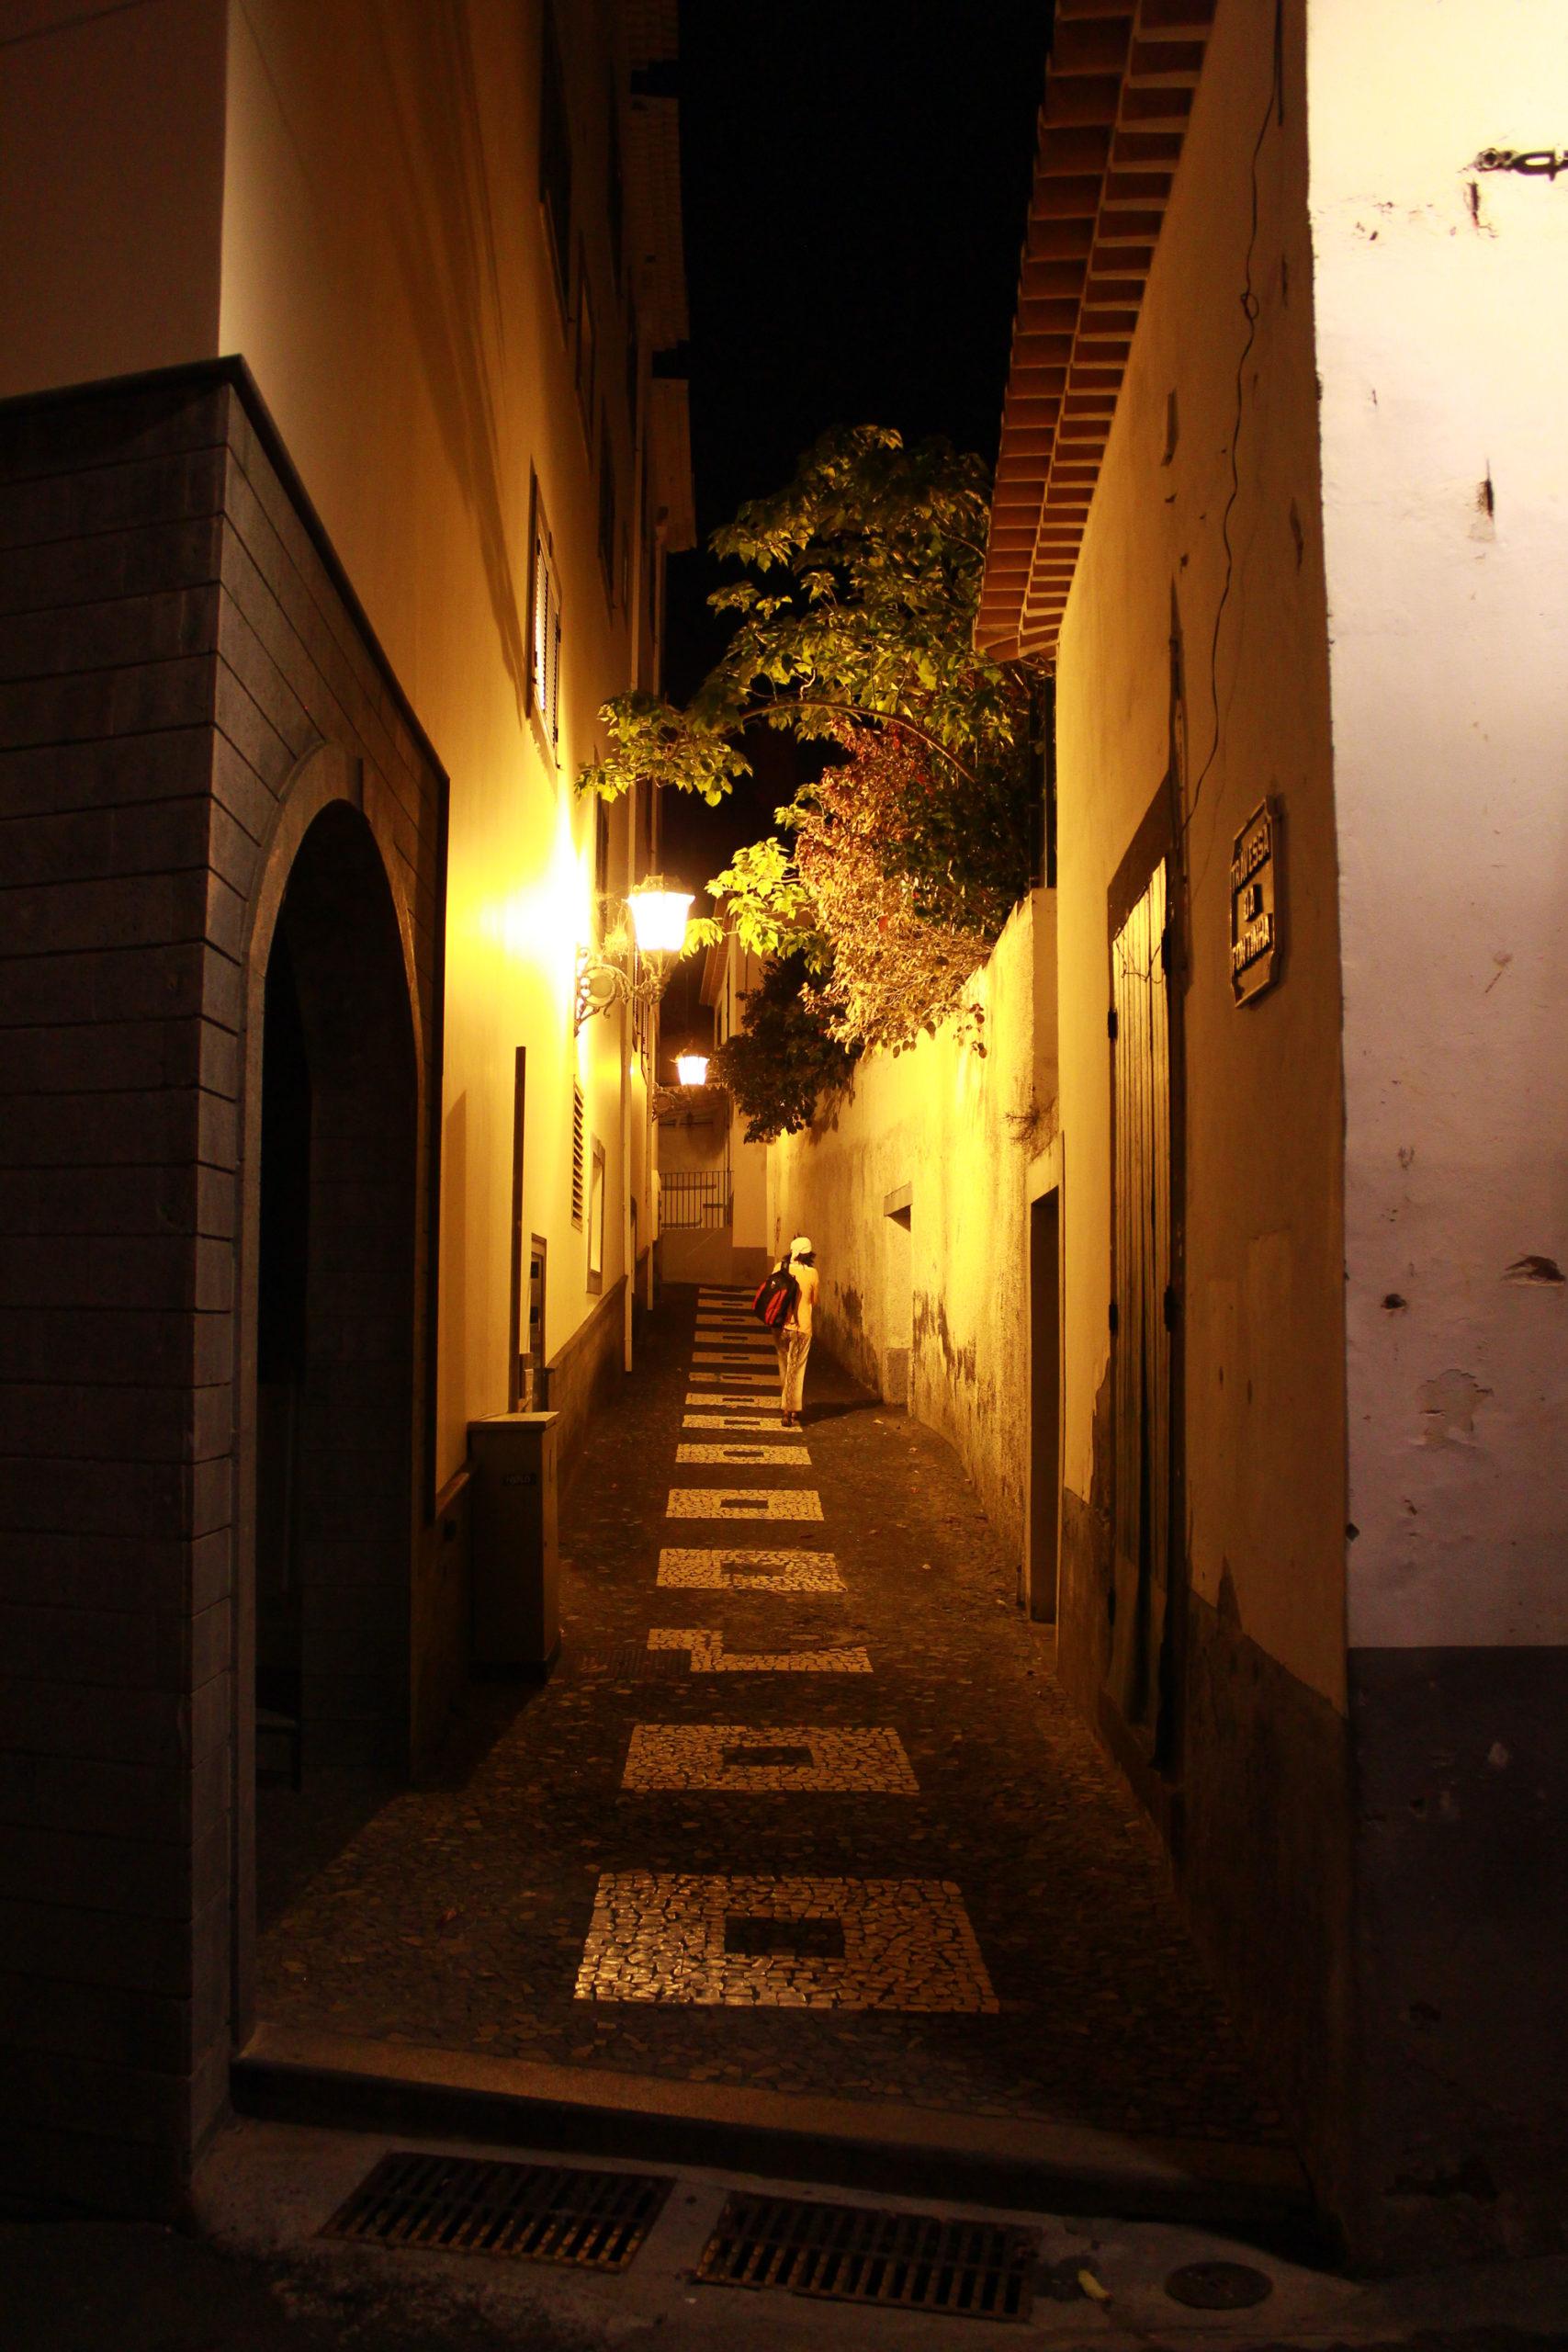 madera widok na uliczkę nocą